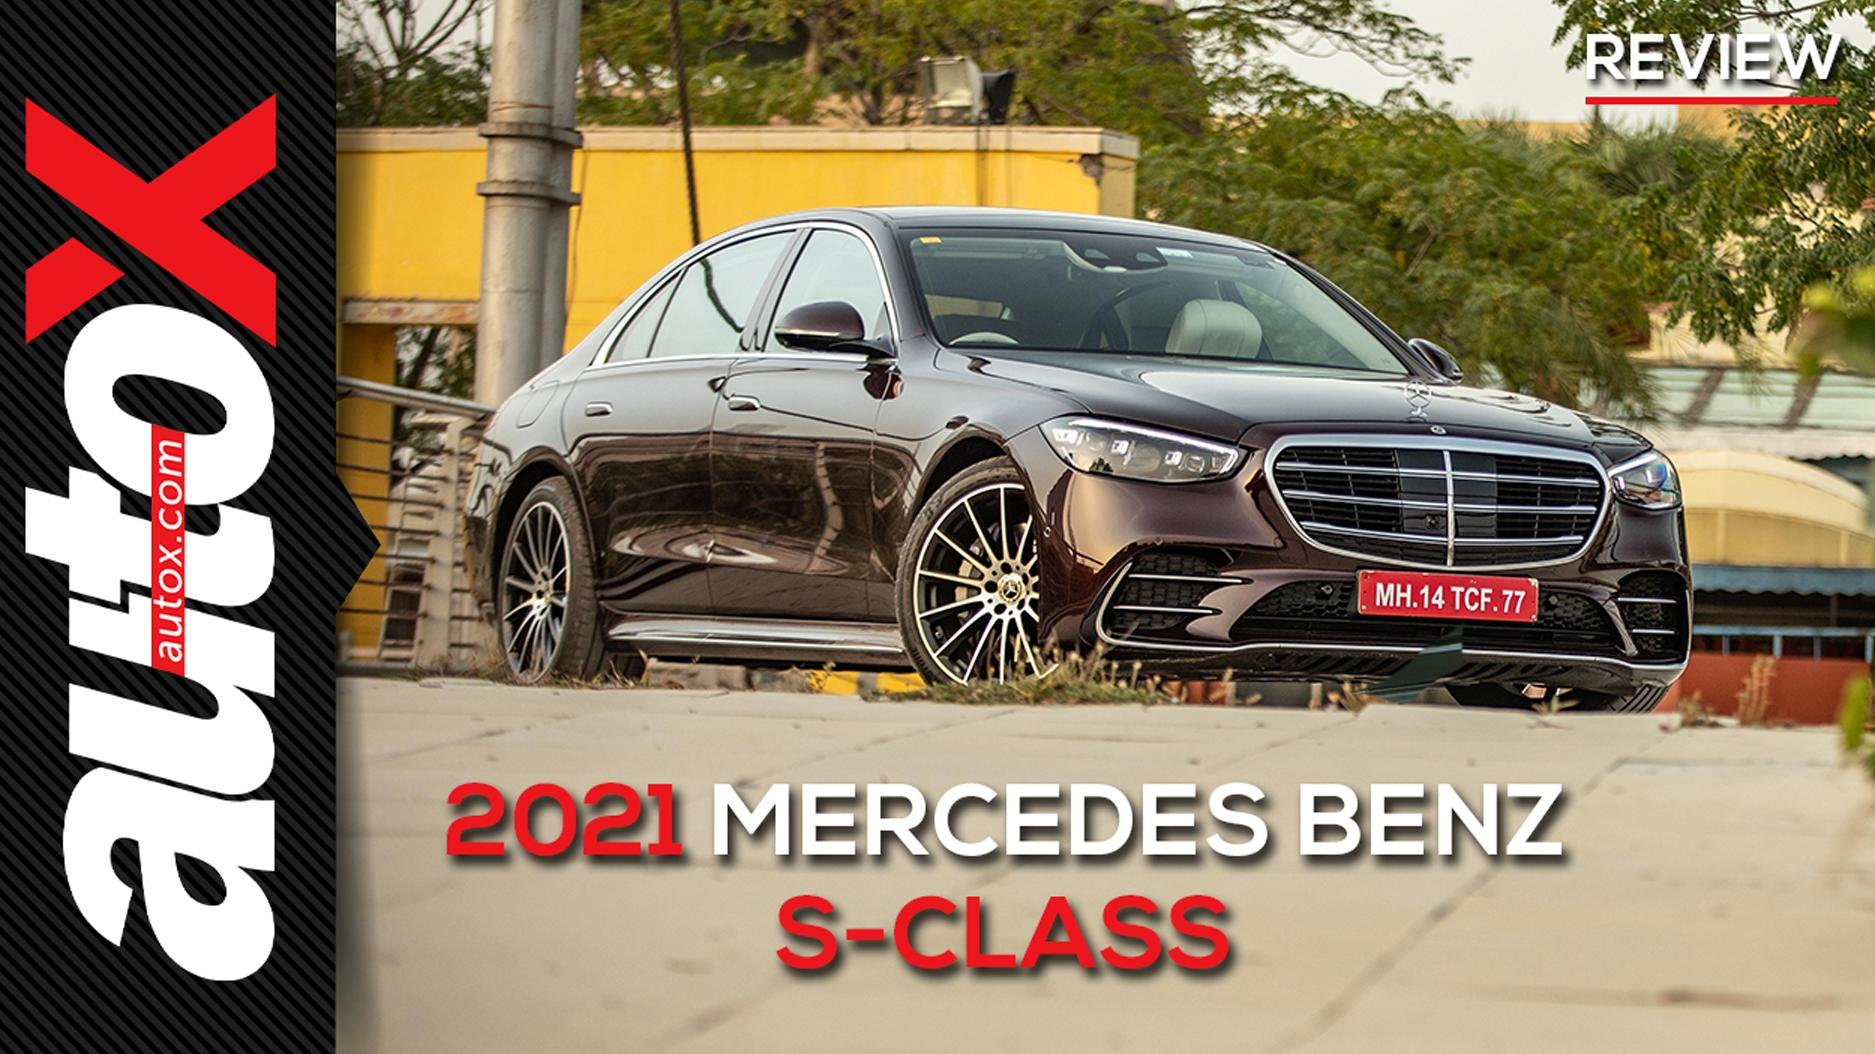 New Mercedes S-Class: A technology & design powerhouse | Review | autoX